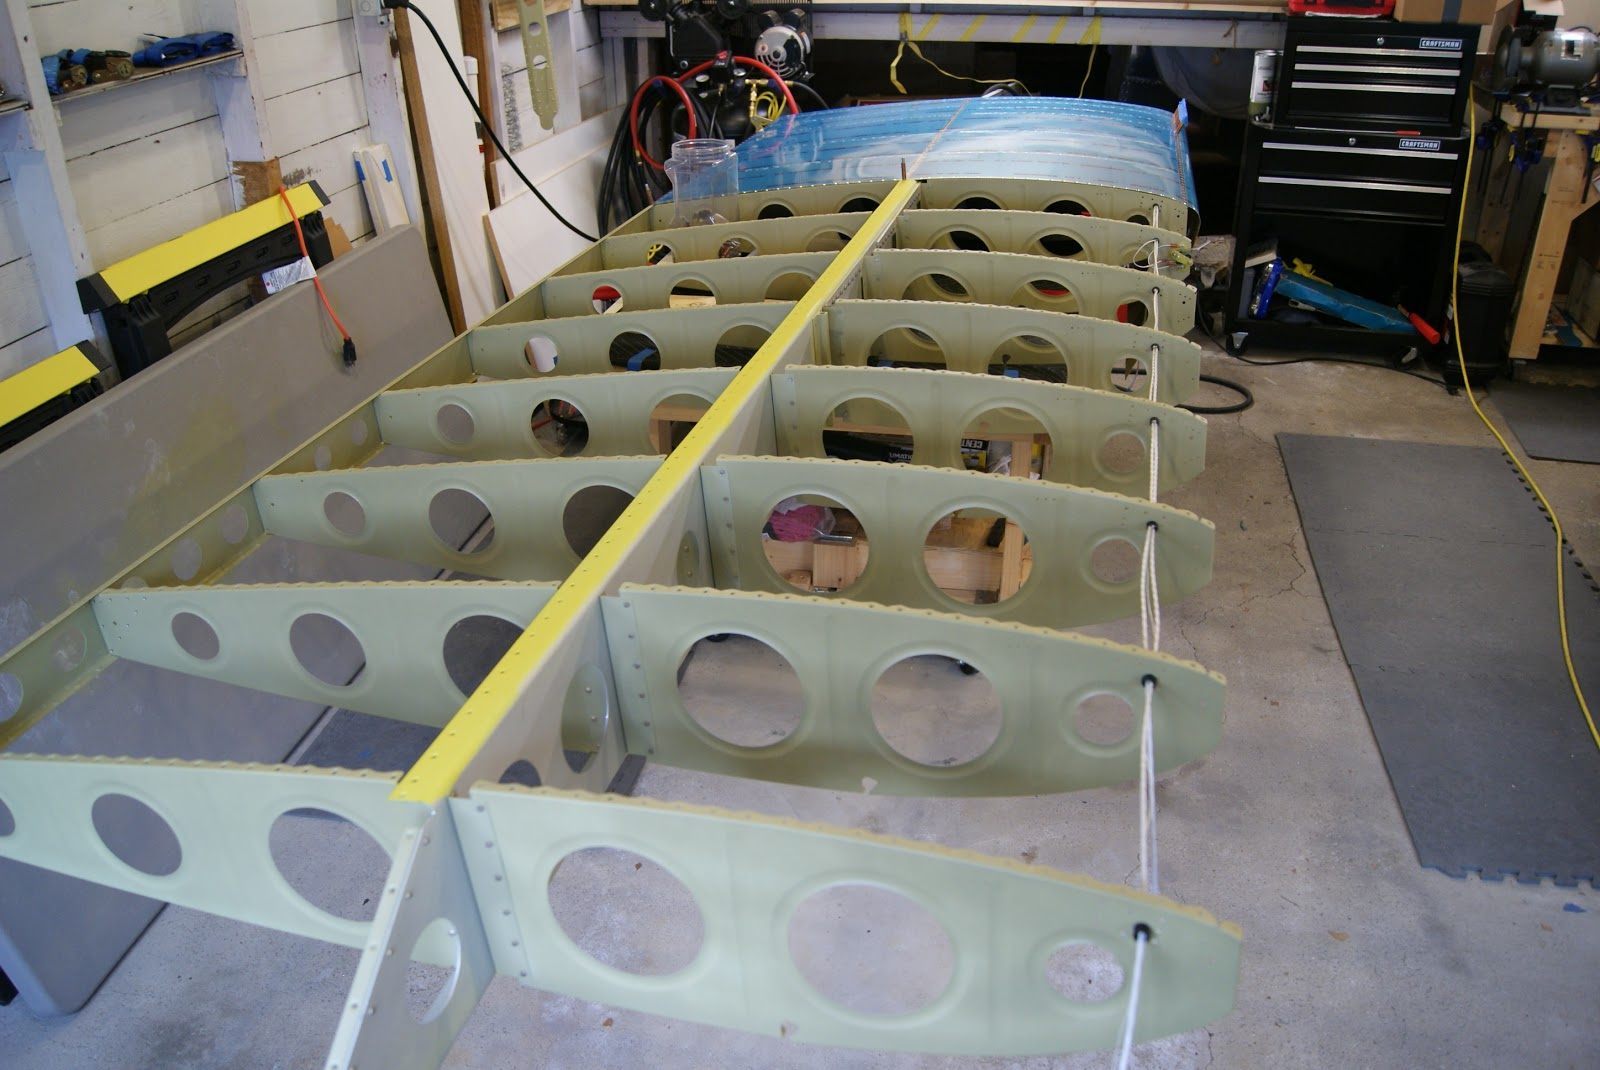 Dog Aviation John S Rv 12 Blog W 1201 L Skin Riveted Onto